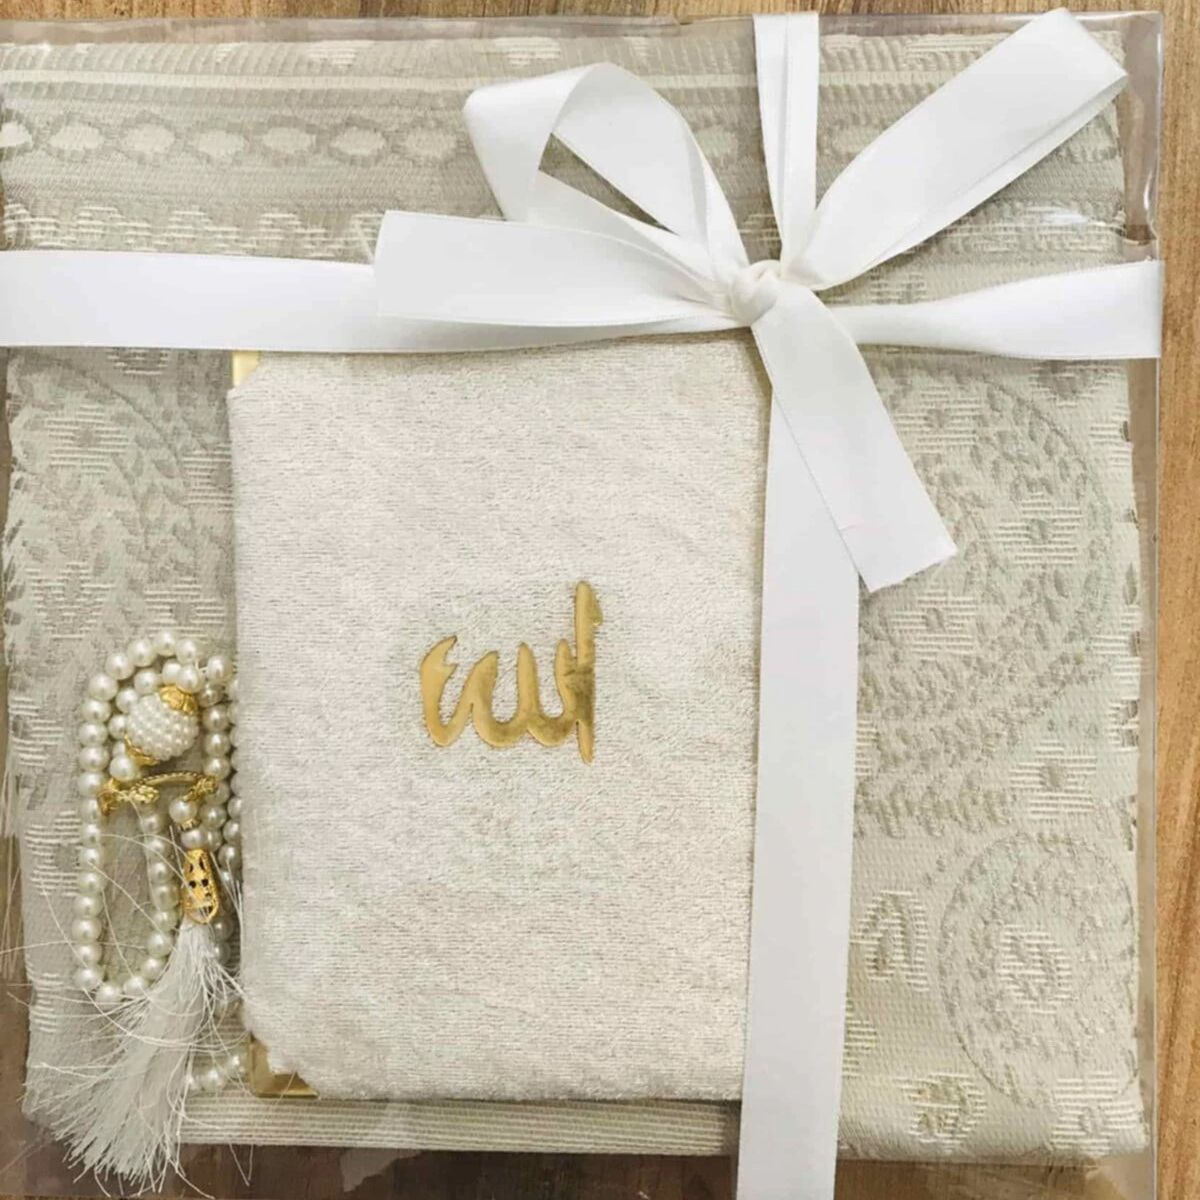 Seccade Seti Prayer Rug Set 3Pcs Muslim Set Arabic Islamic Items Mevlüt Umrah Gift Sijadat Rug